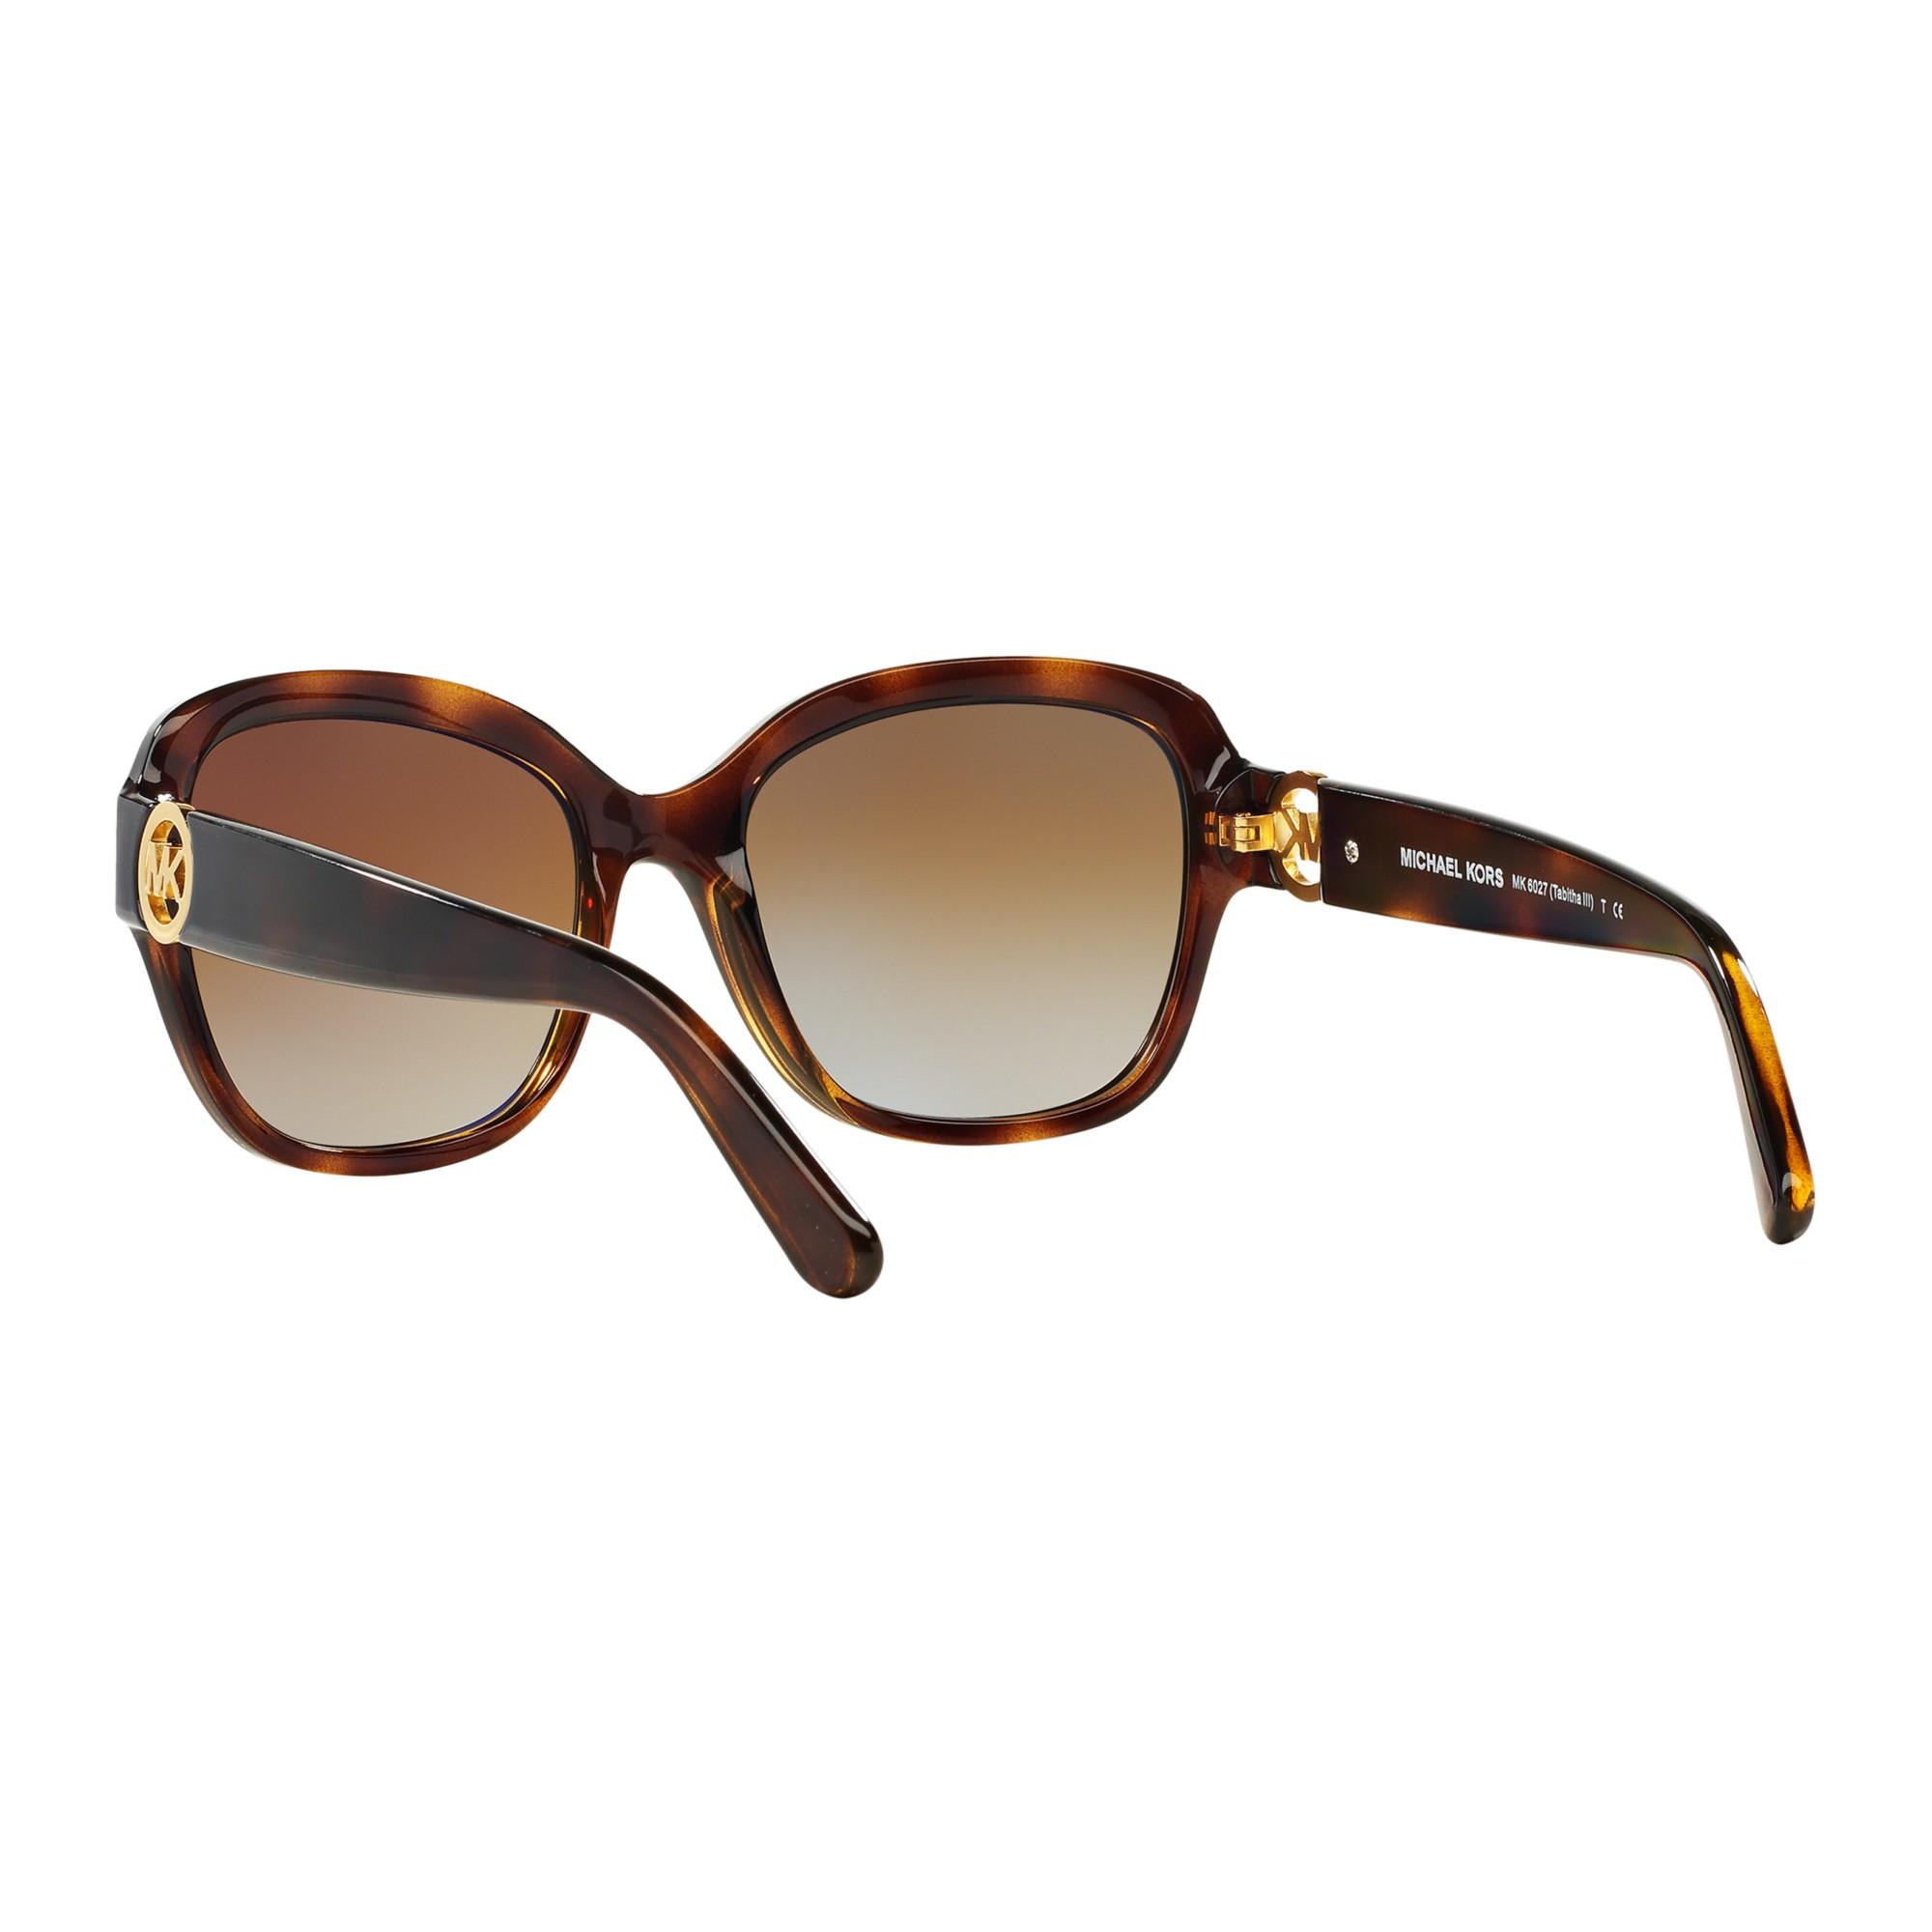 5041976f2d Michael Kors Mk6027 Tabitha Iii Polarised Square Sunglasses in Brown ...